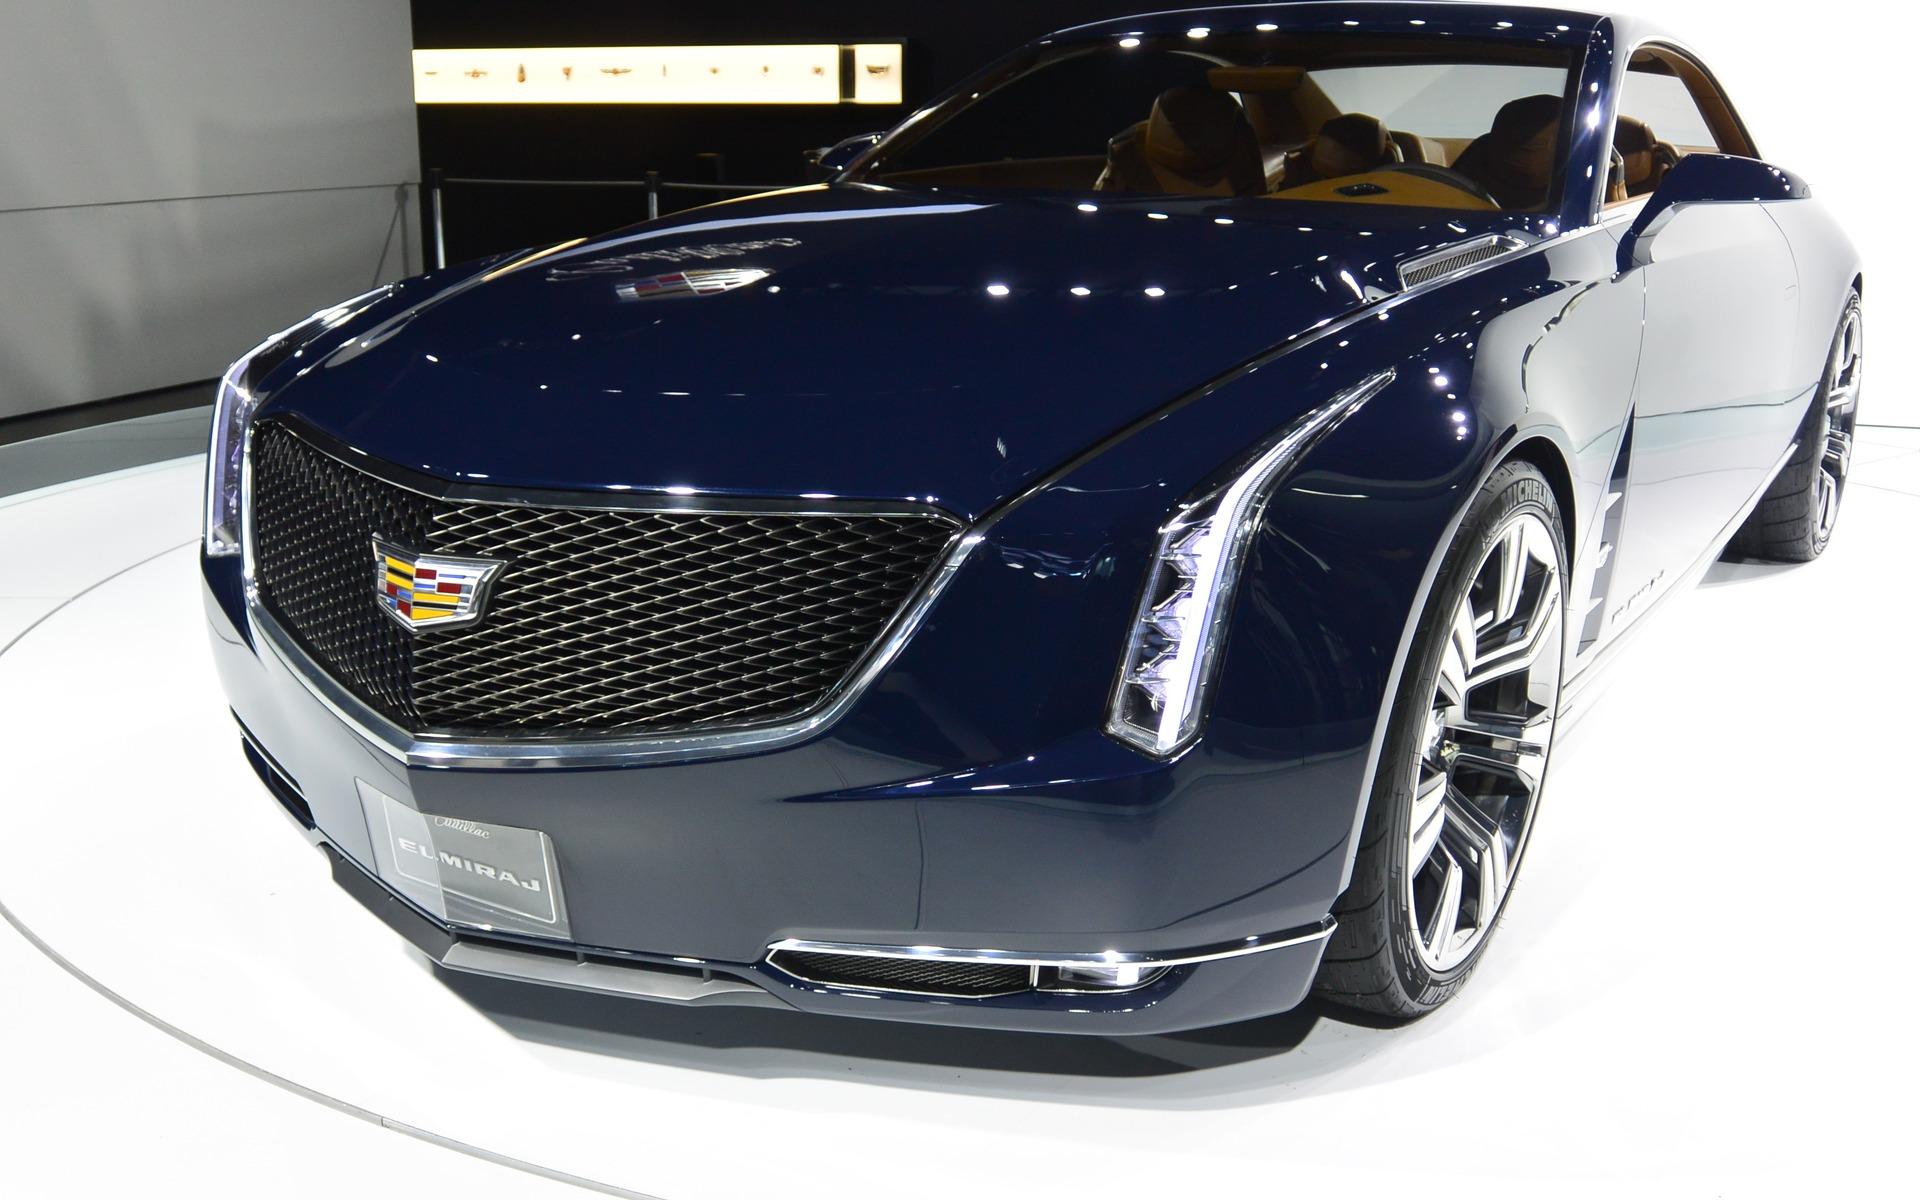 cadillac show elmiraj fron motion news beach reveal more automobile concept pebble revealed at